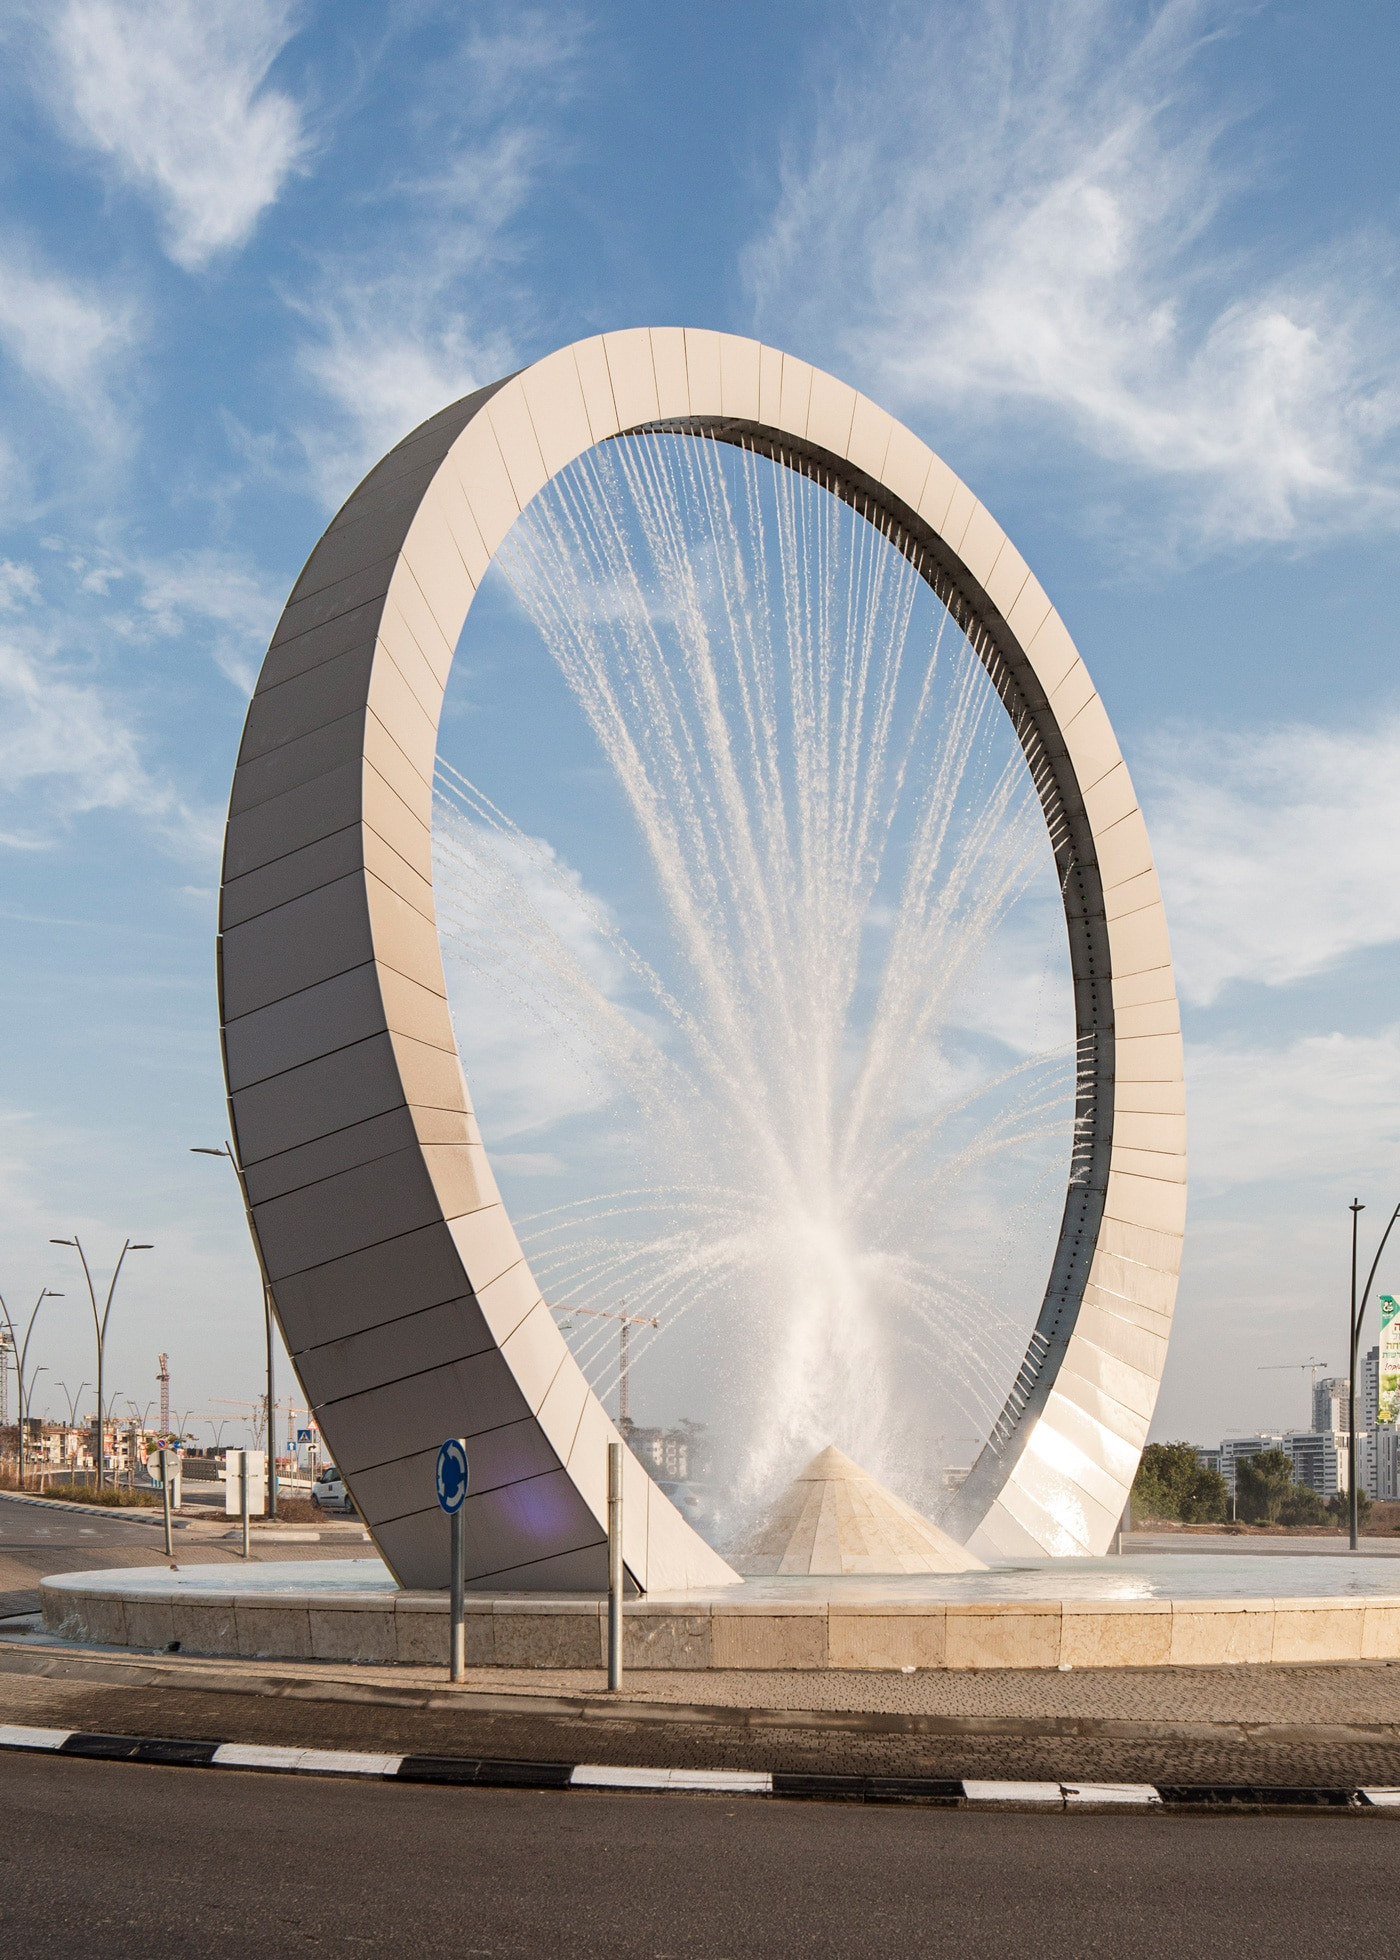 Kiryat Gat Water Fountain  - Nimrod Levy4 55